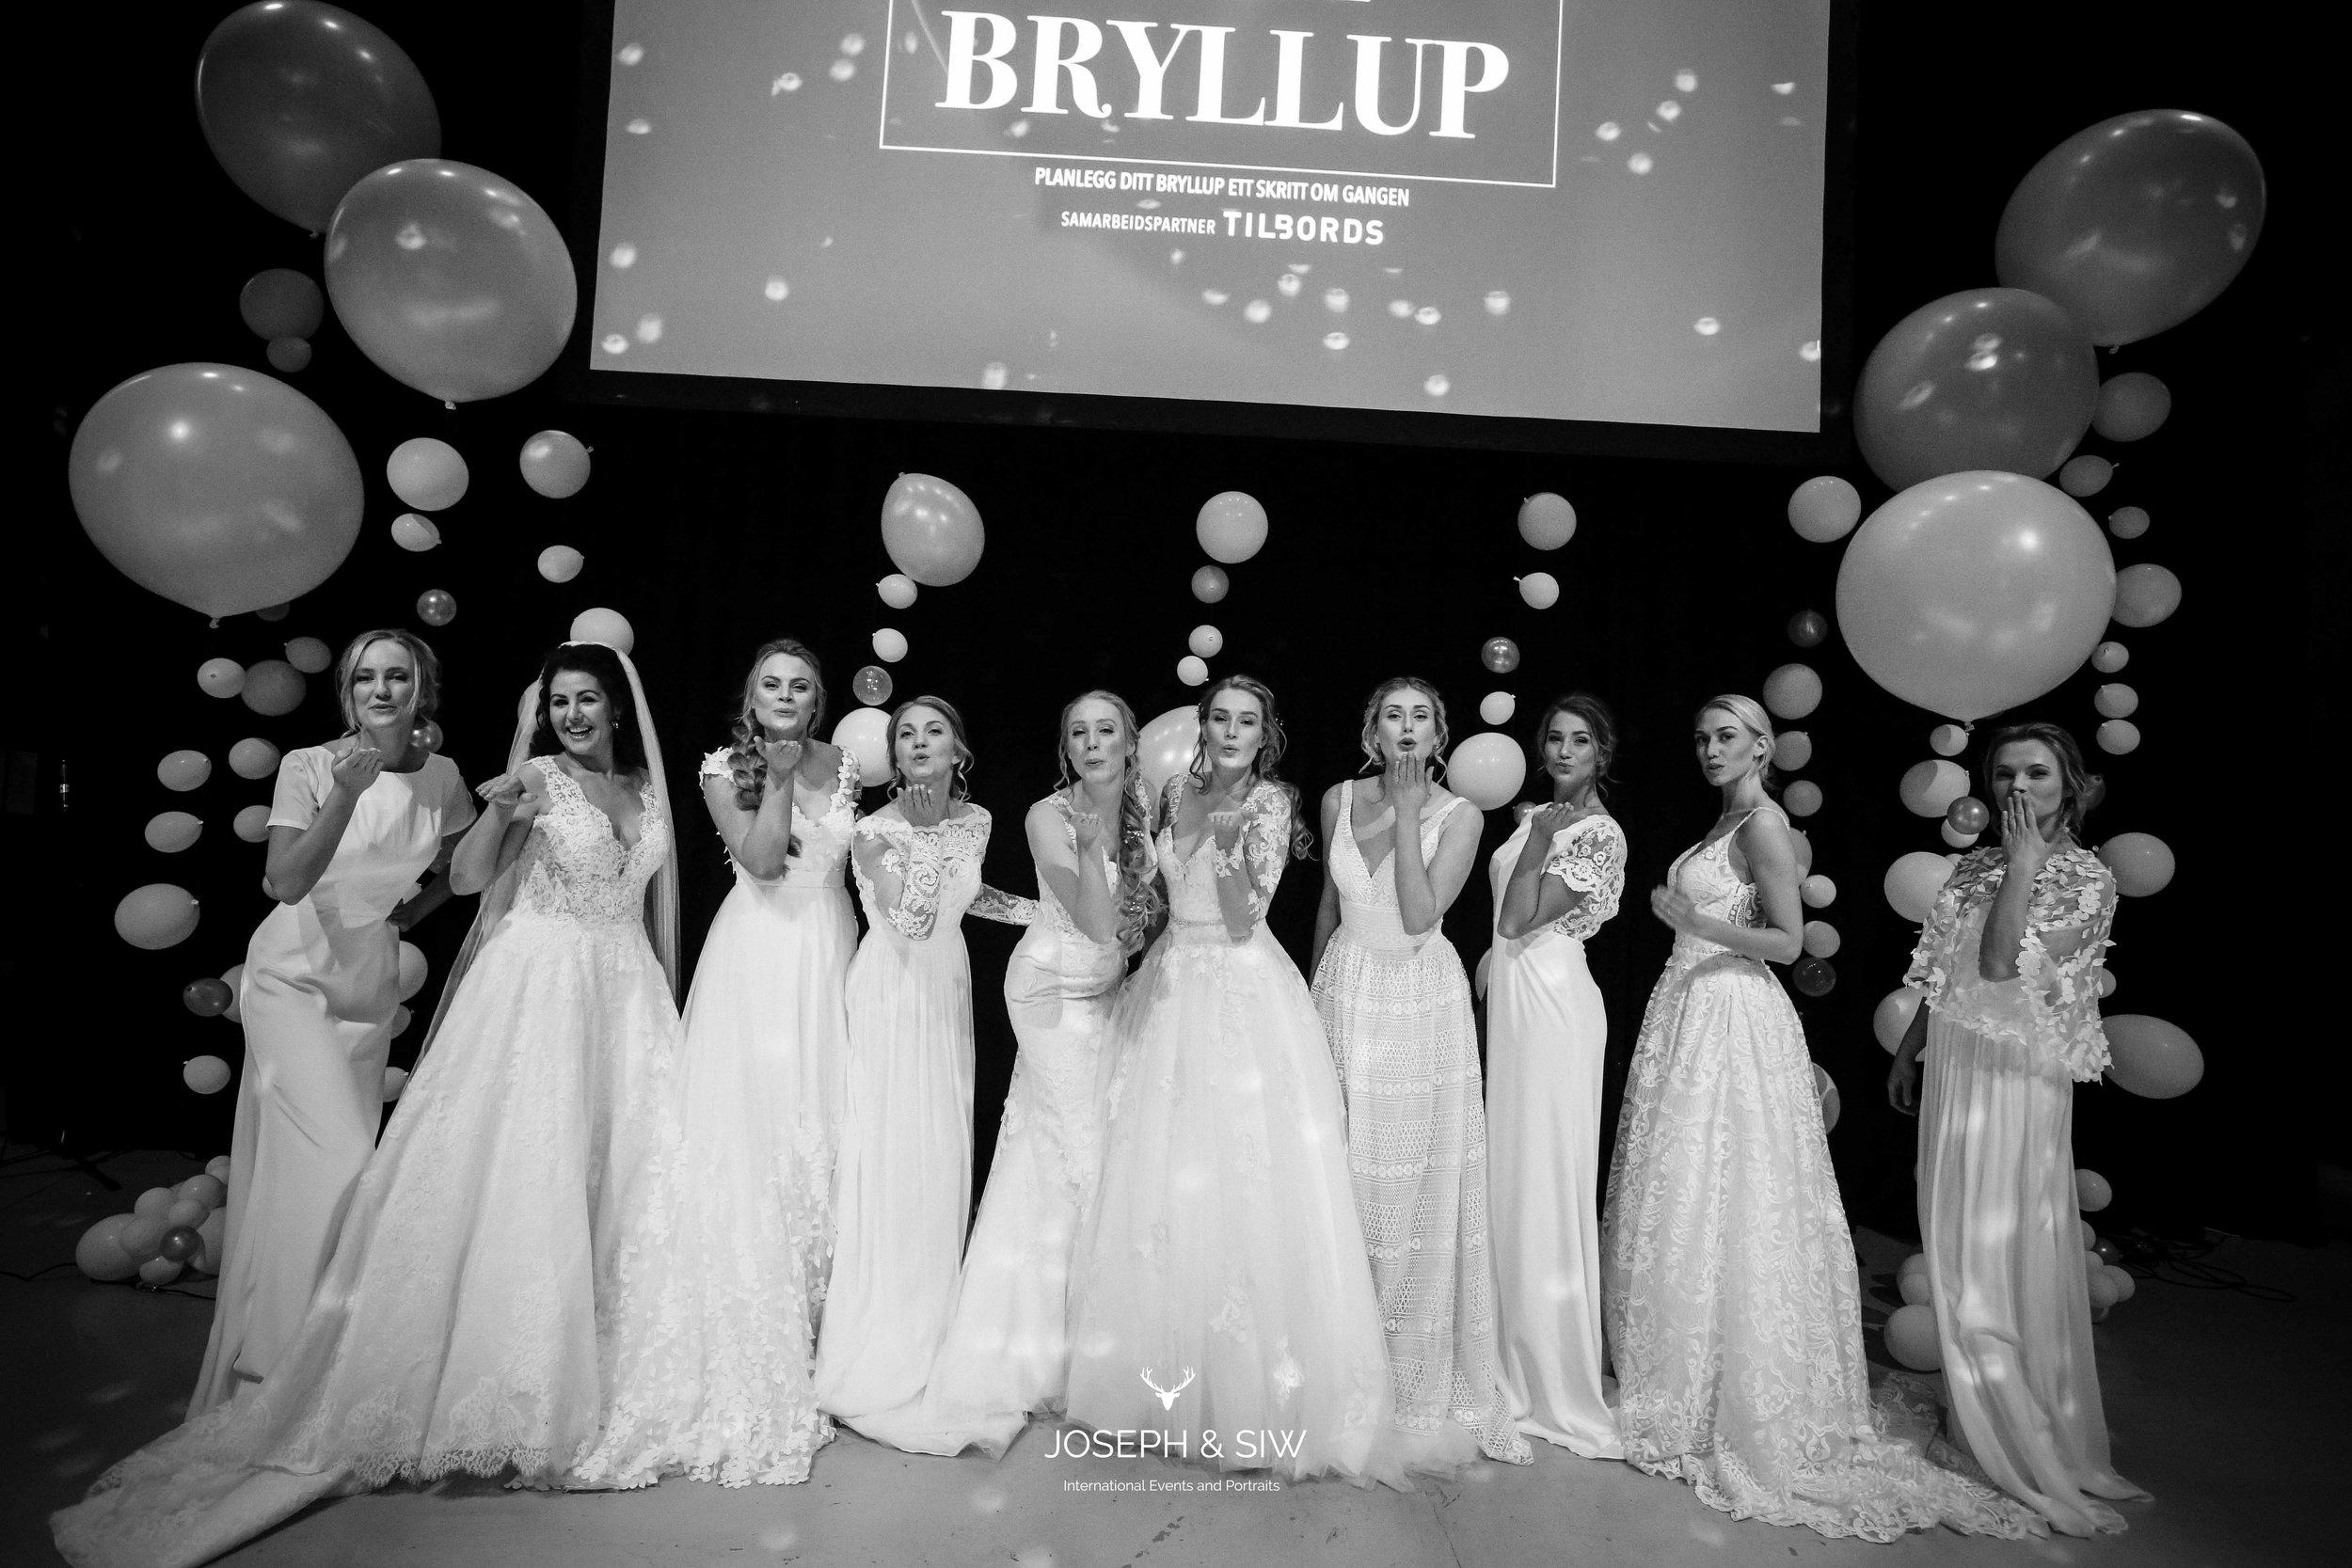 mittbryllup_bryllupsmesse_i_oslo_149.jpg